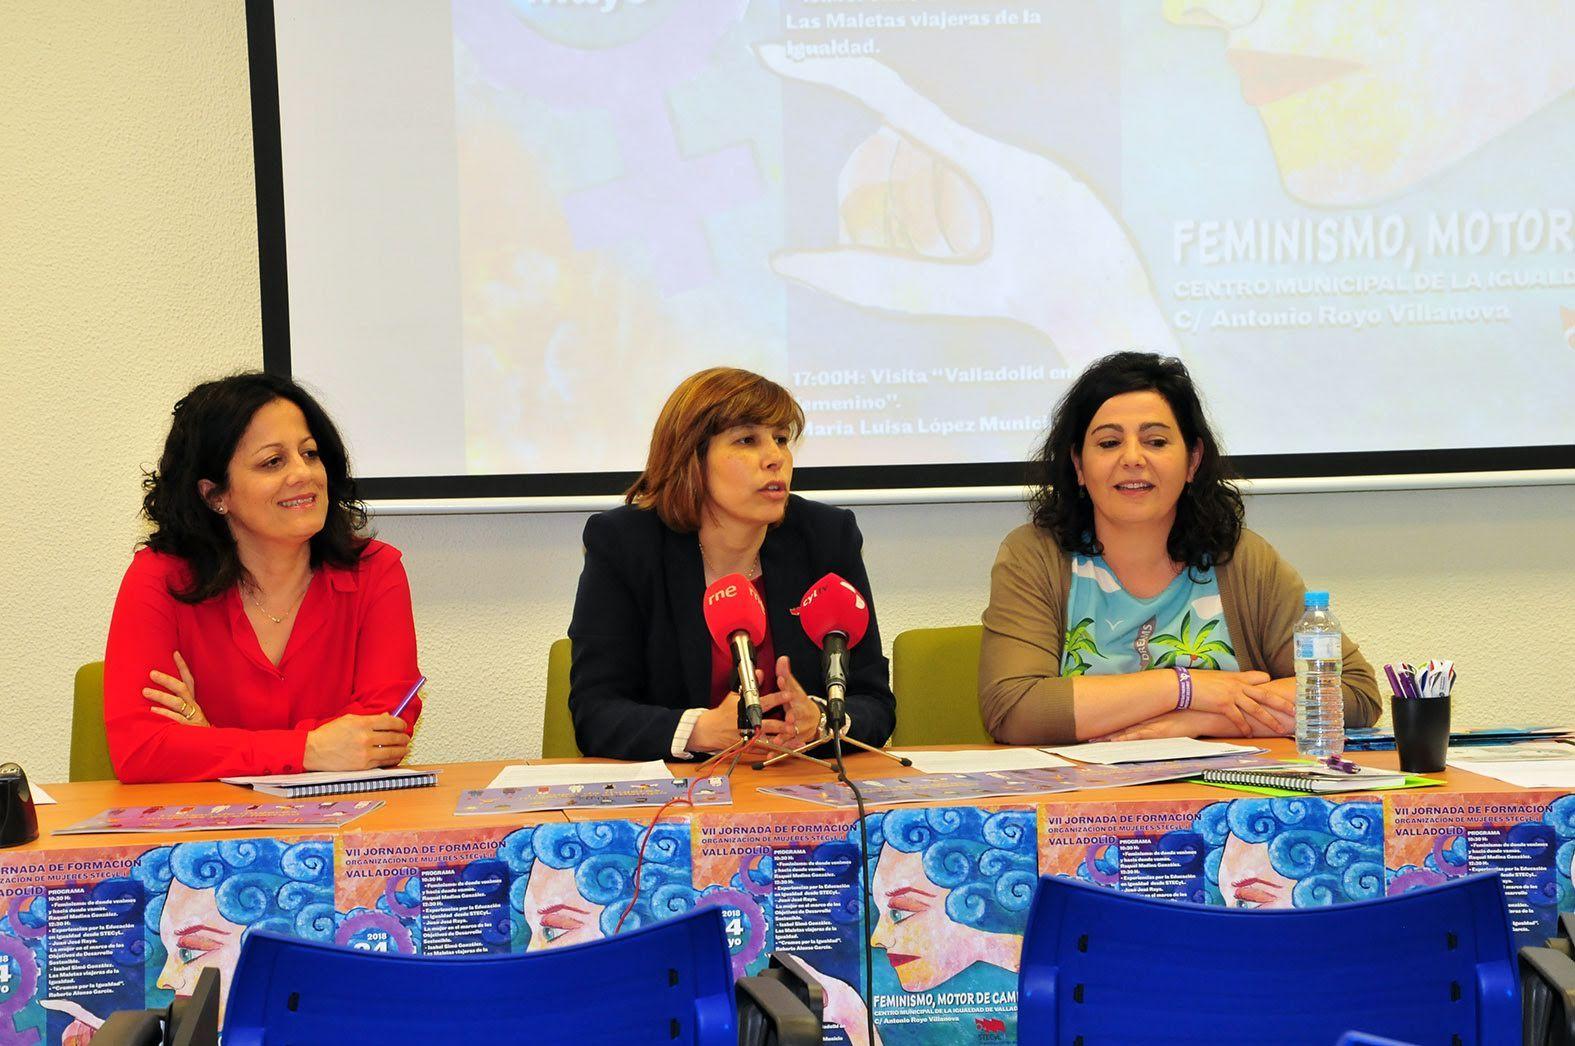 VII-Jornadas-Formacion-OM STECyL-i-Valladolid-24M 2018-FLS_2344